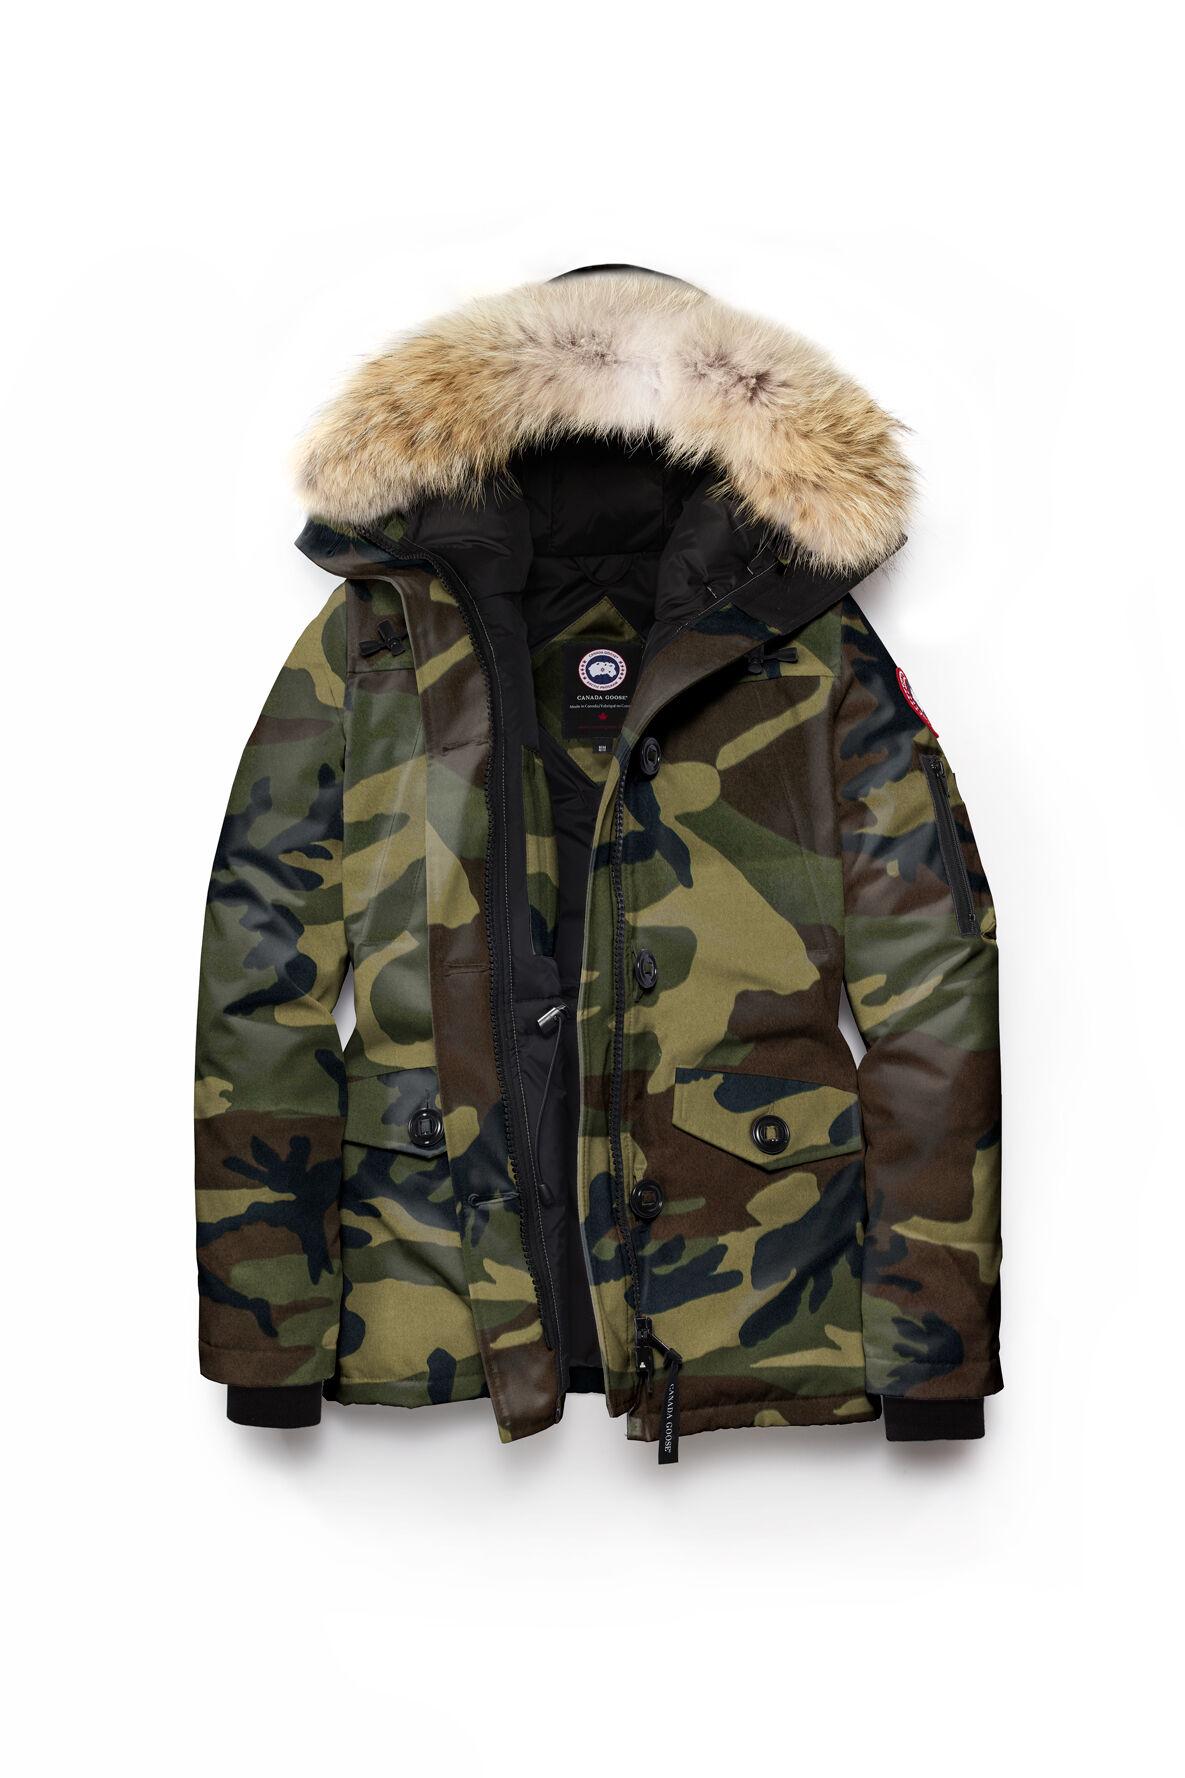 Women's winter jackets canada goose